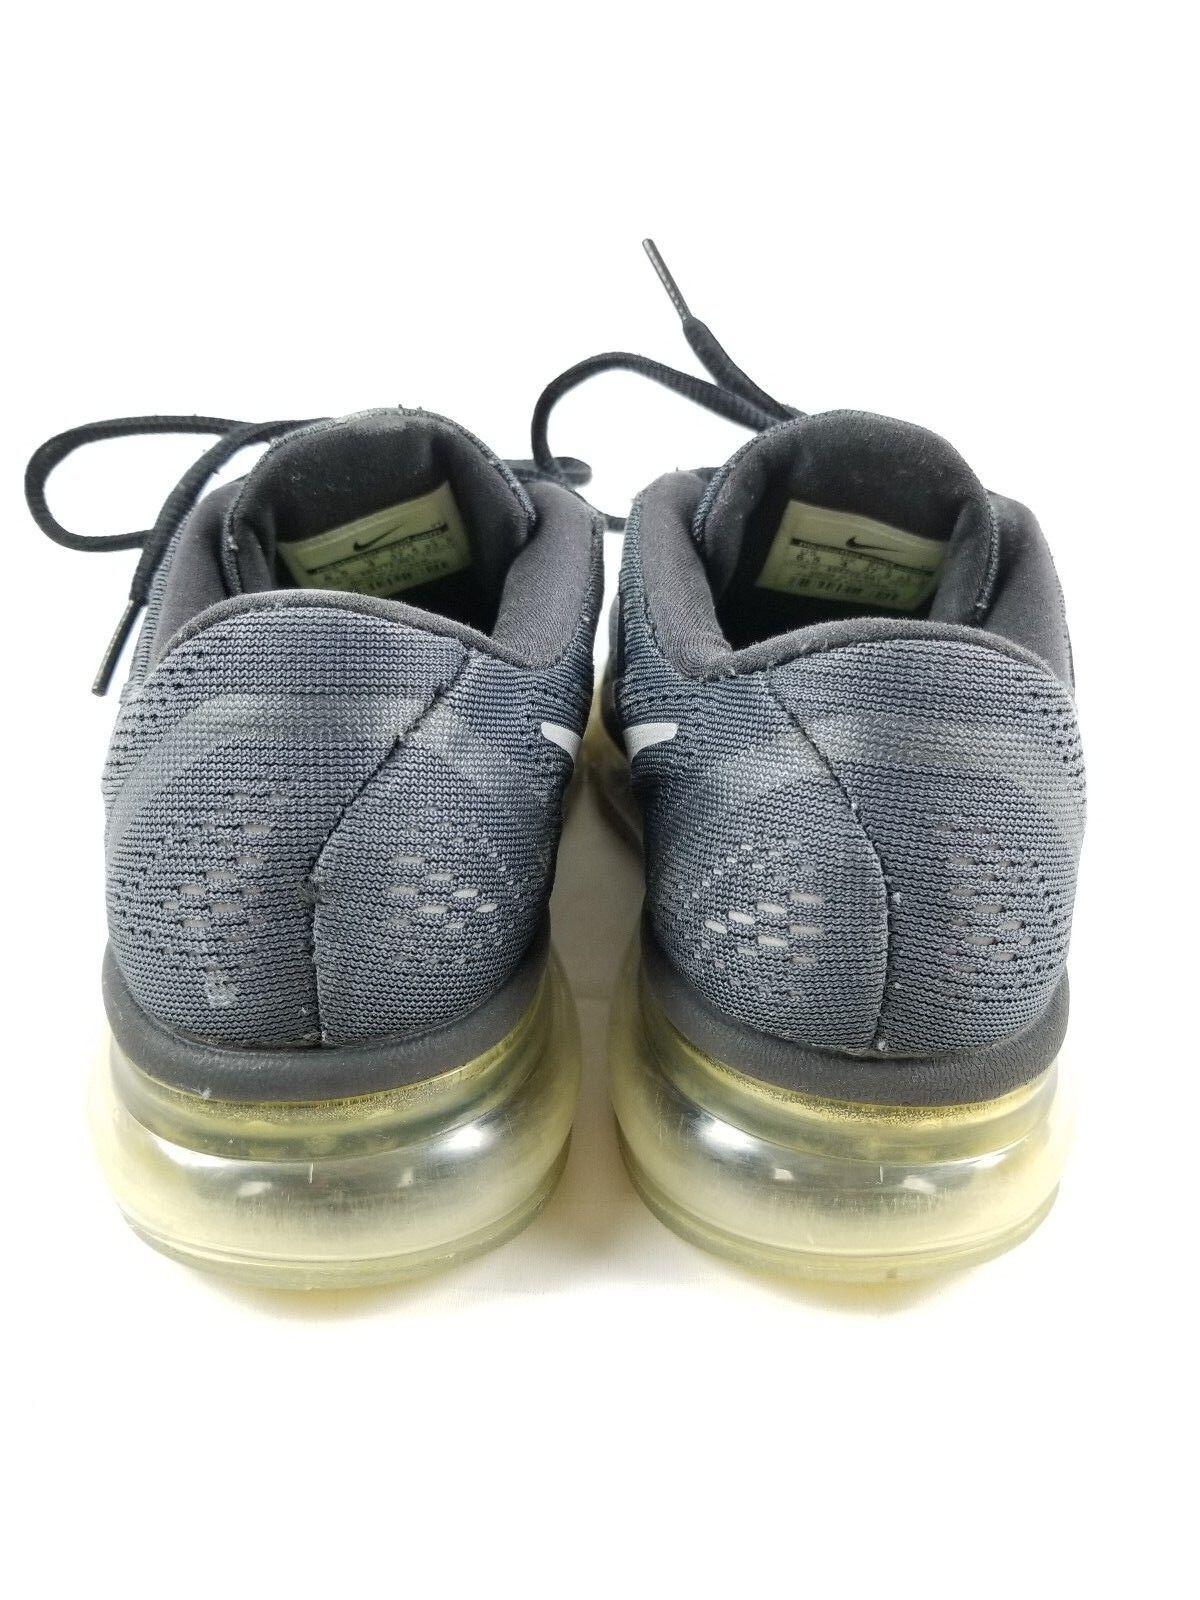 low priced 08452 ec476 ... 2016 Nike Air Max Women s Women s Women s Running Shoes Size 6.5 Black  White 806772-001 ...